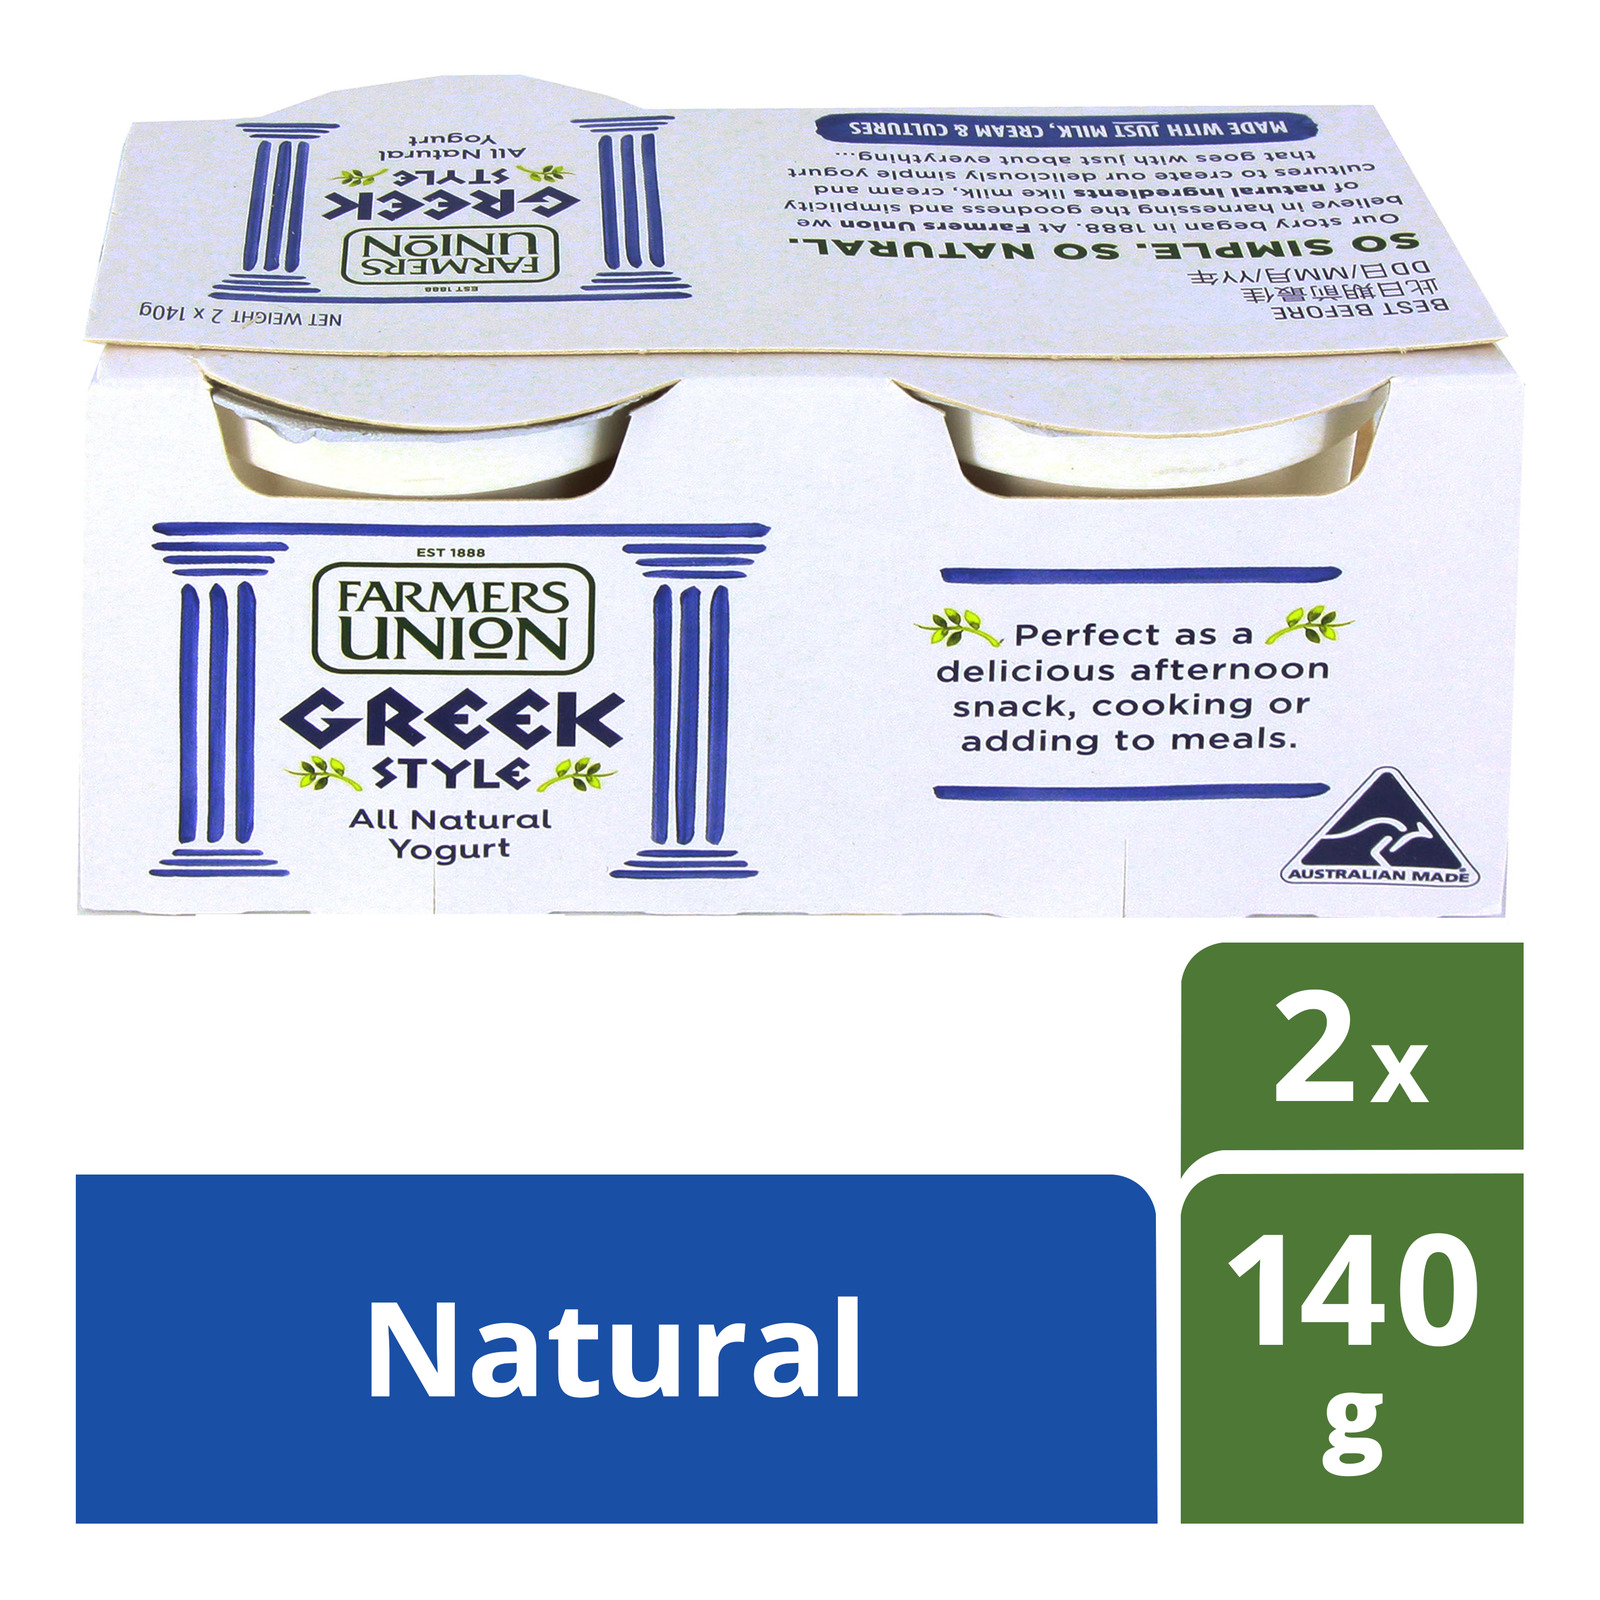 Farmers Union Greek Style Natural Yoghurt 2x140G